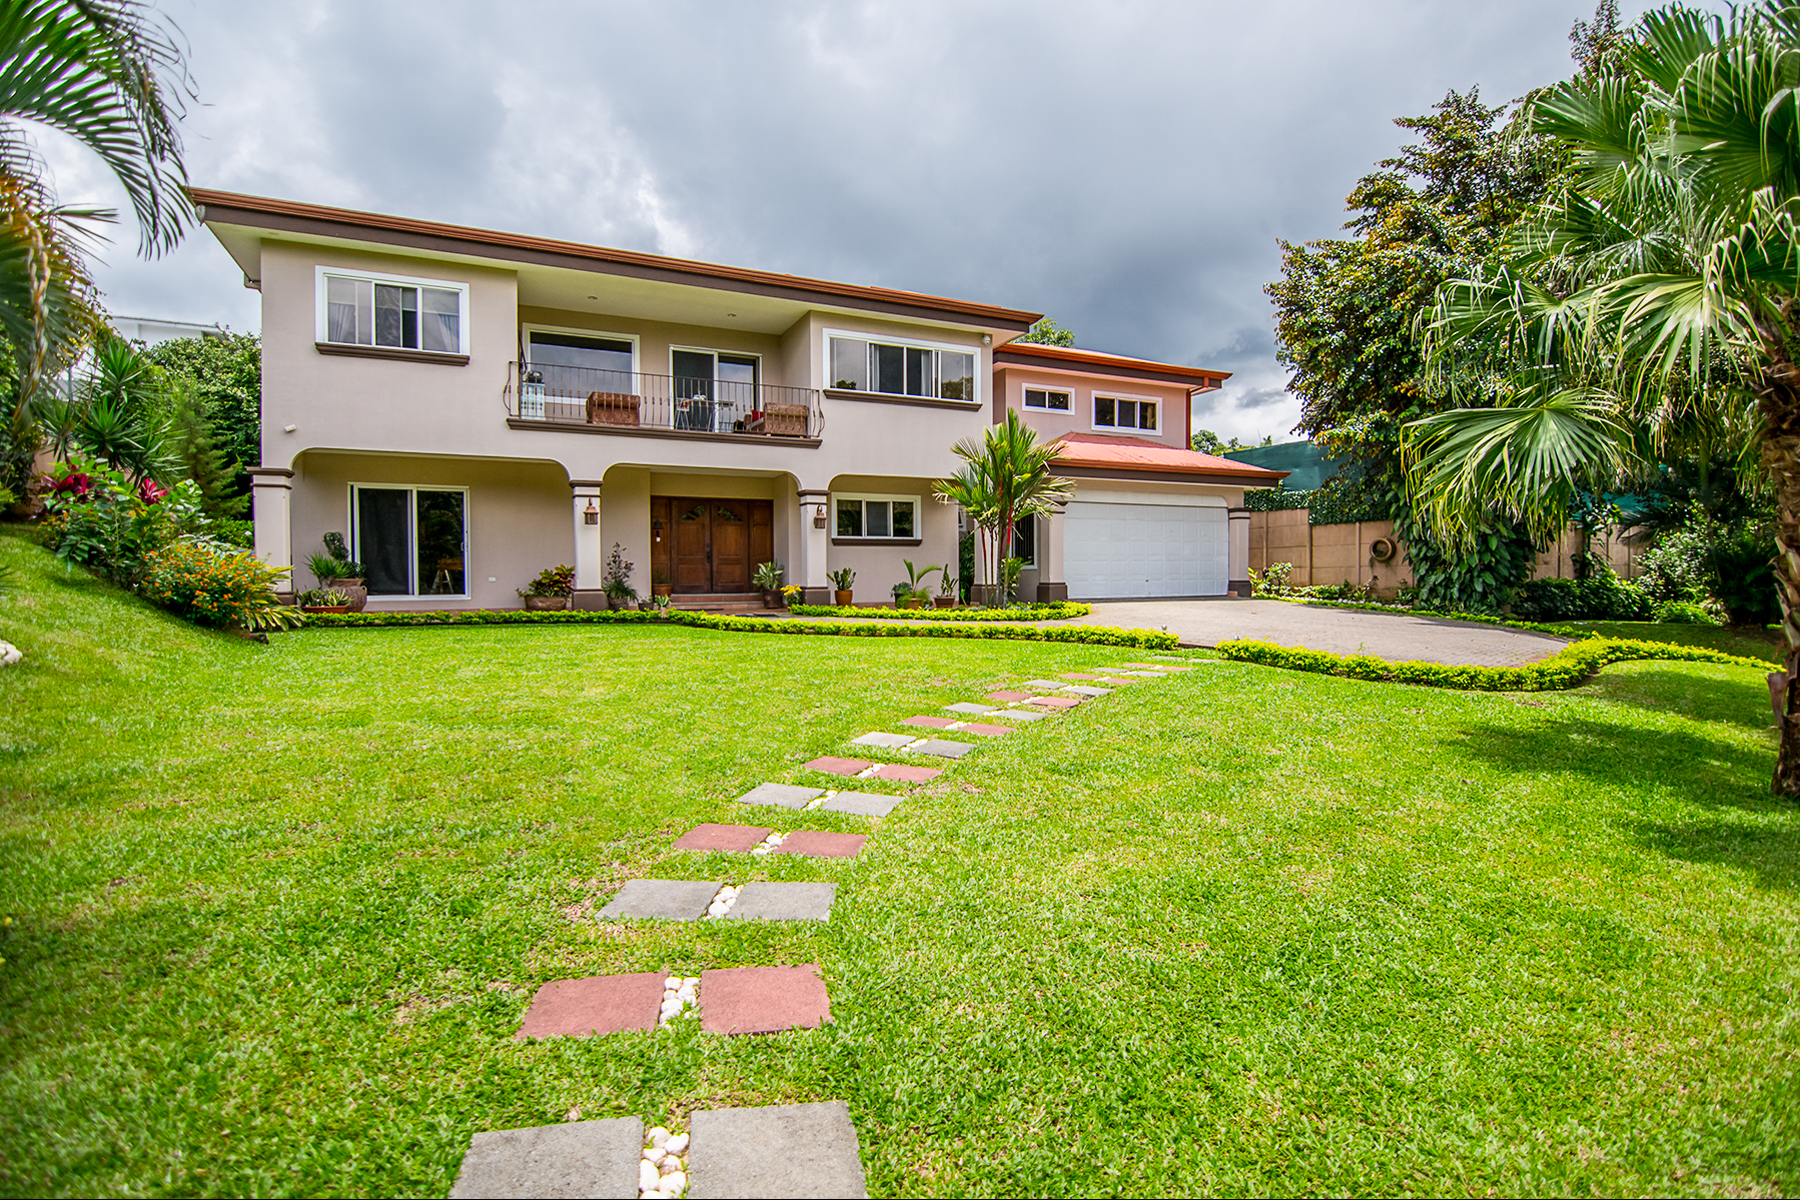 Single Family Homes for Sale at Casa Campo, Ciudad Colón Other San Jose, San Jose Costa Rica